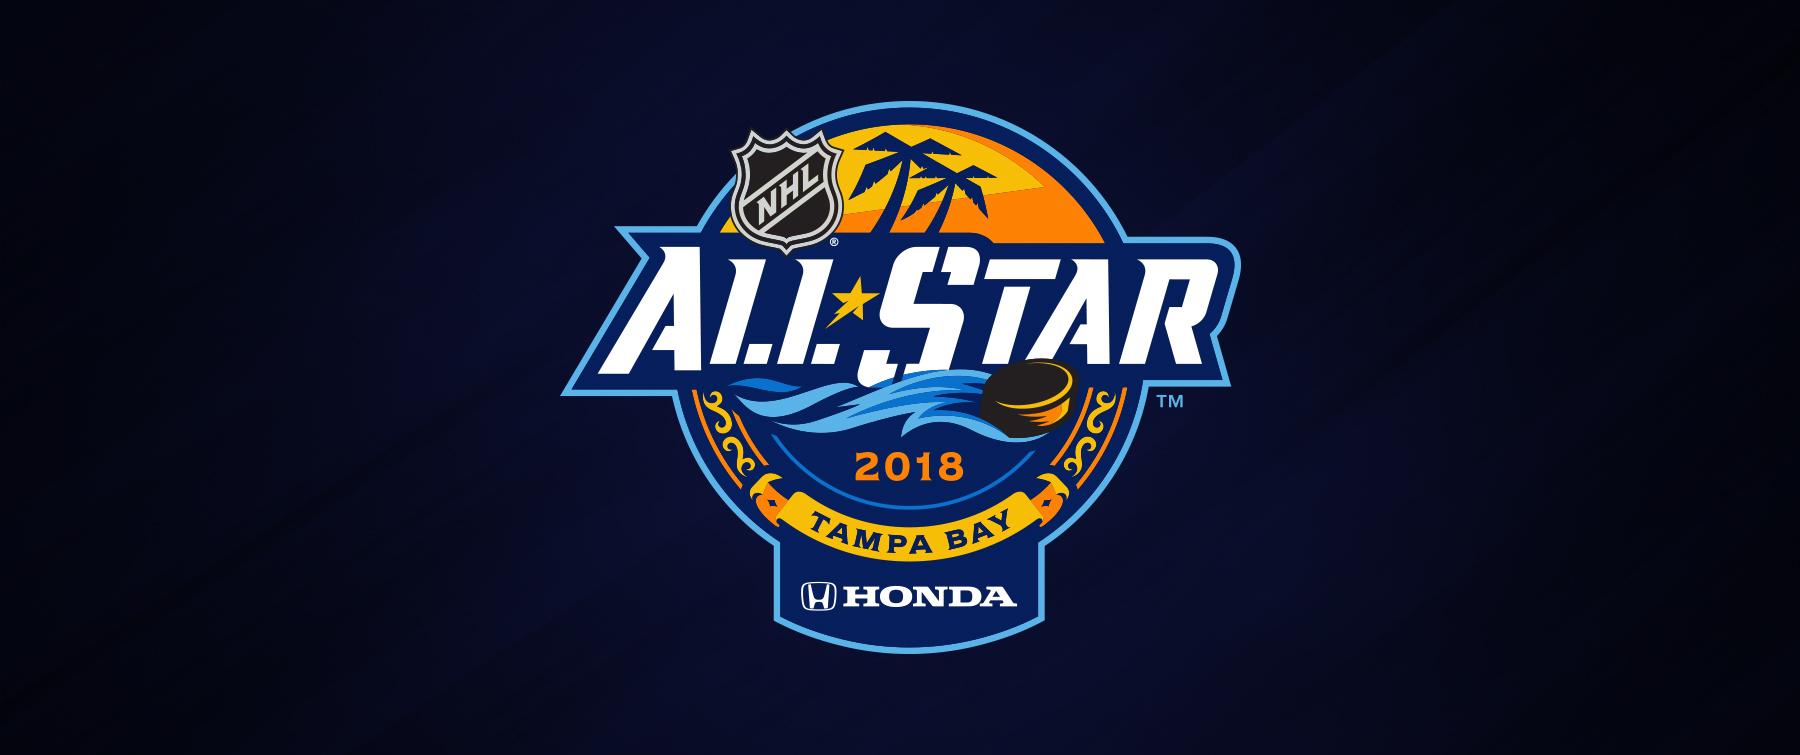 NHL and T&a Bay Lightning unveil 2018 Honda NHL All-Star Game logo & NHL and Tampa Bay Lightning unveil 2018 Honda NHL All-Star Game ... azcodes.com